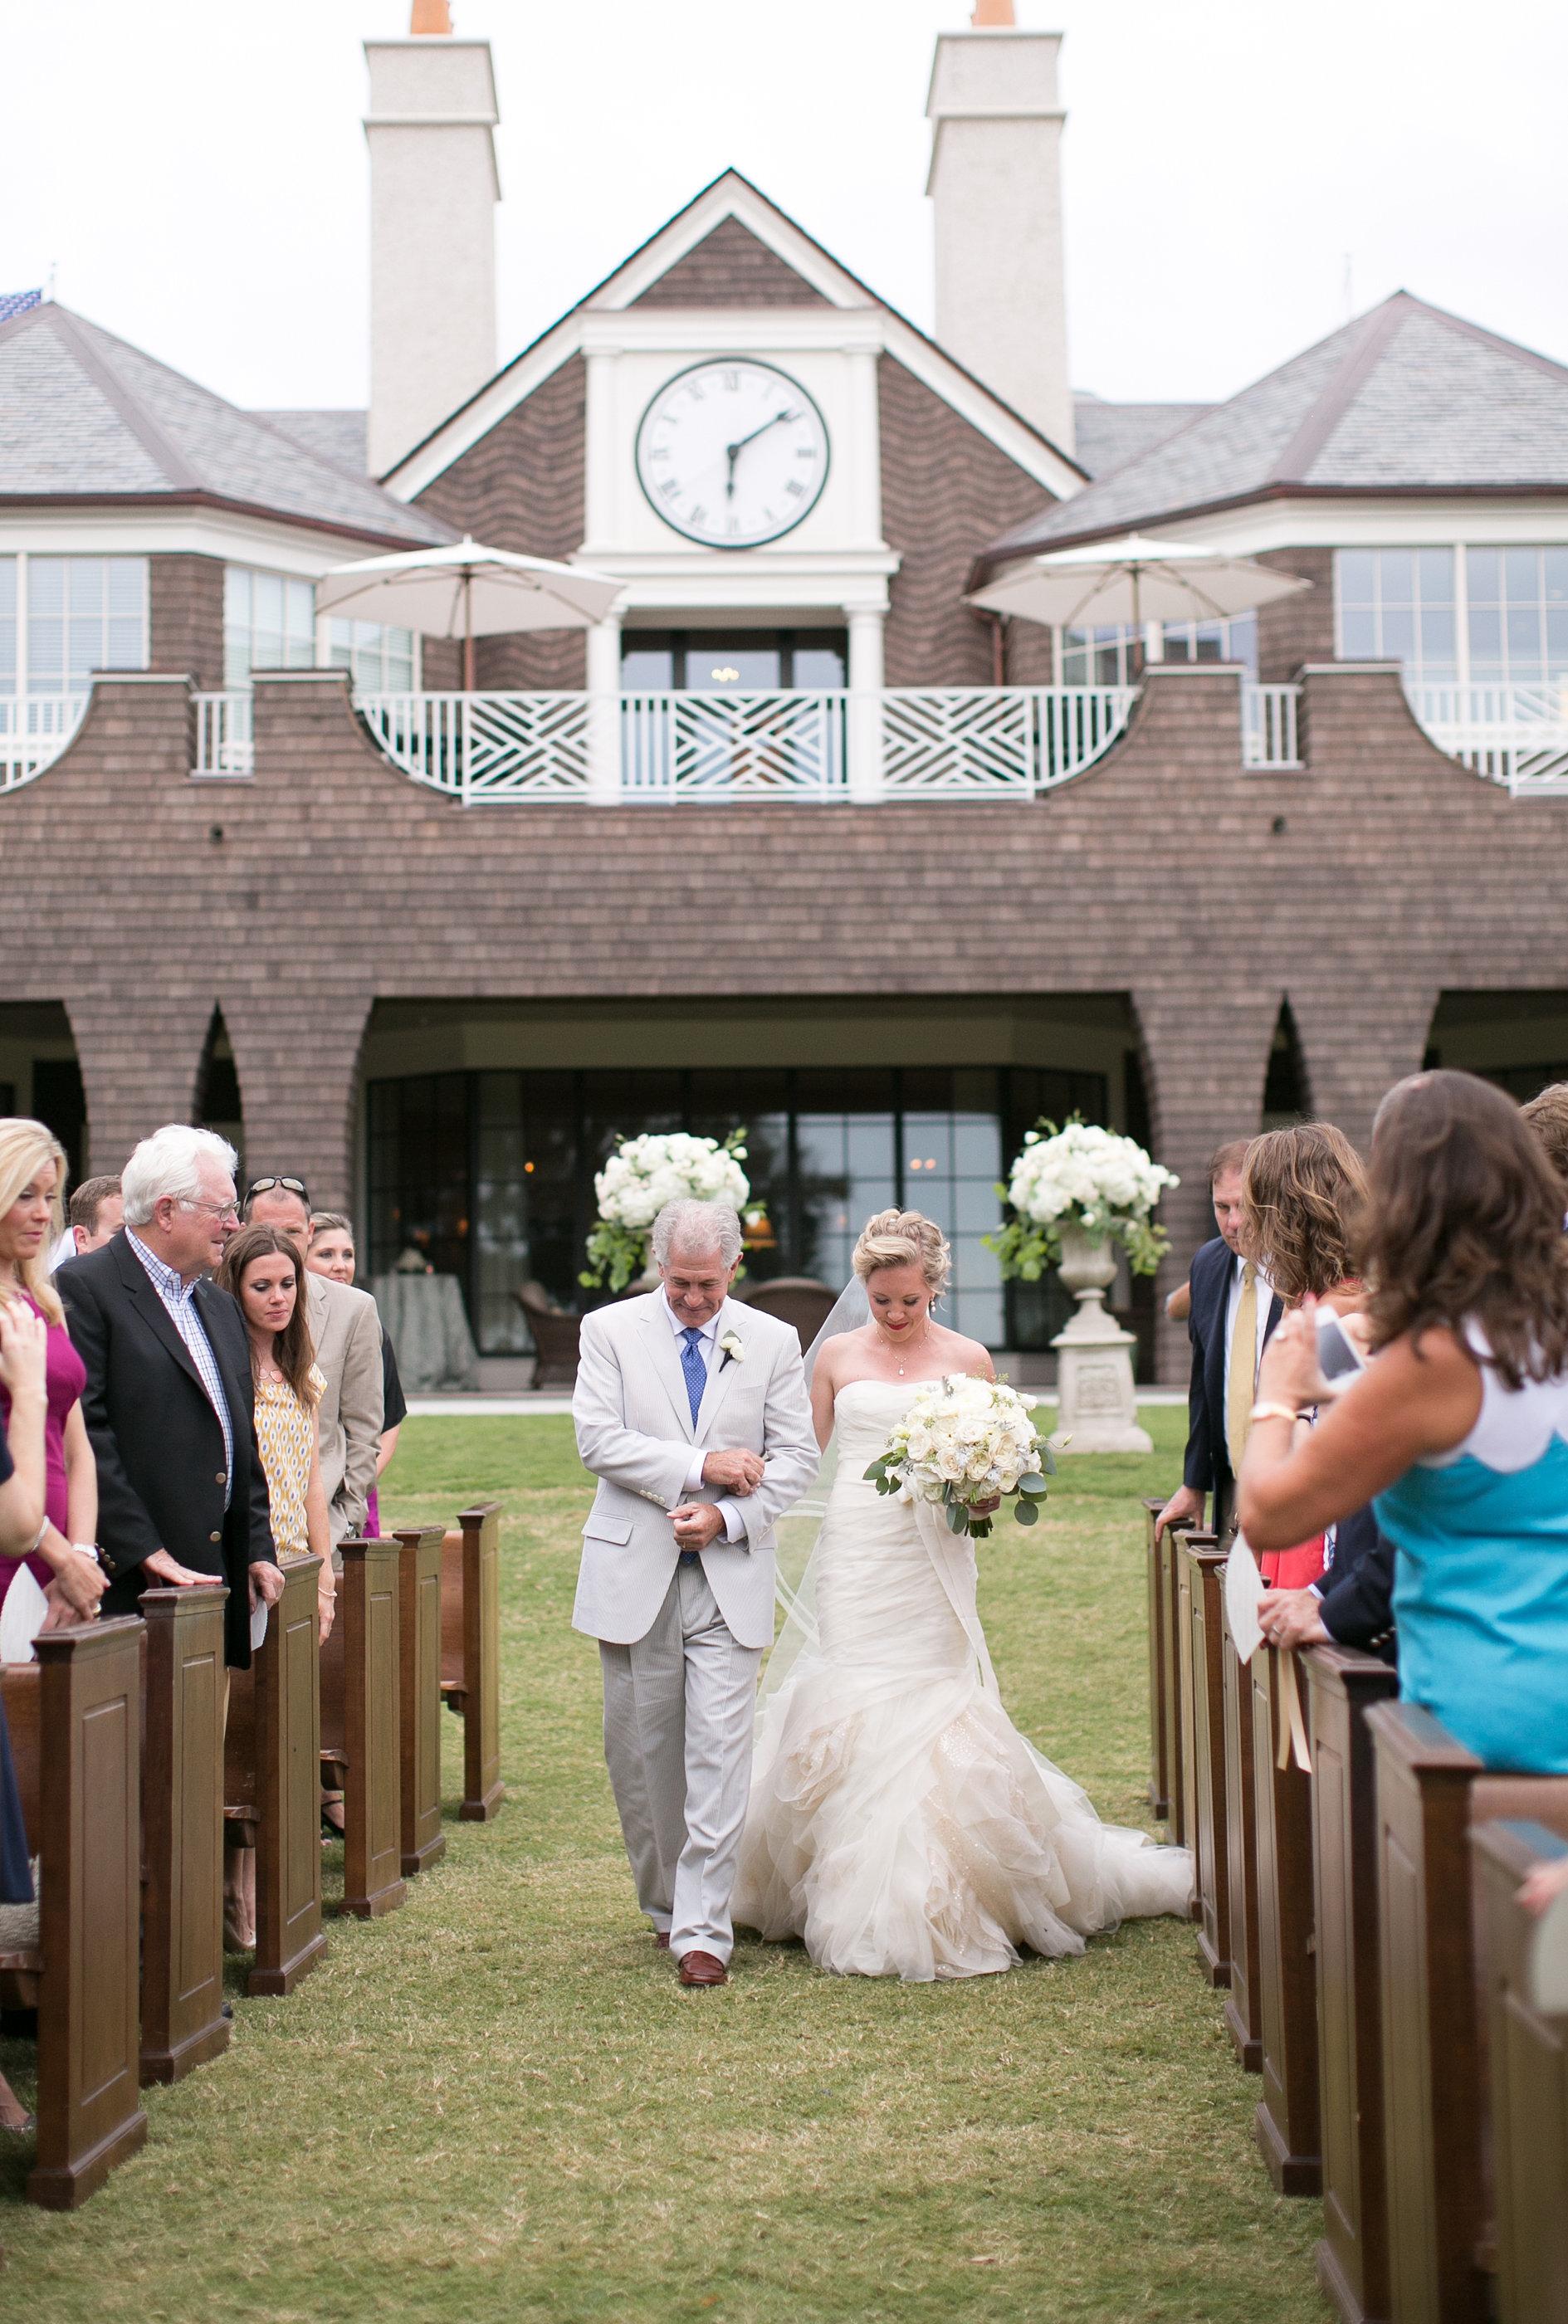 Ceremony Details - Kiawah Island, South Carolina - Fall Wedding - Julian Leaver Events